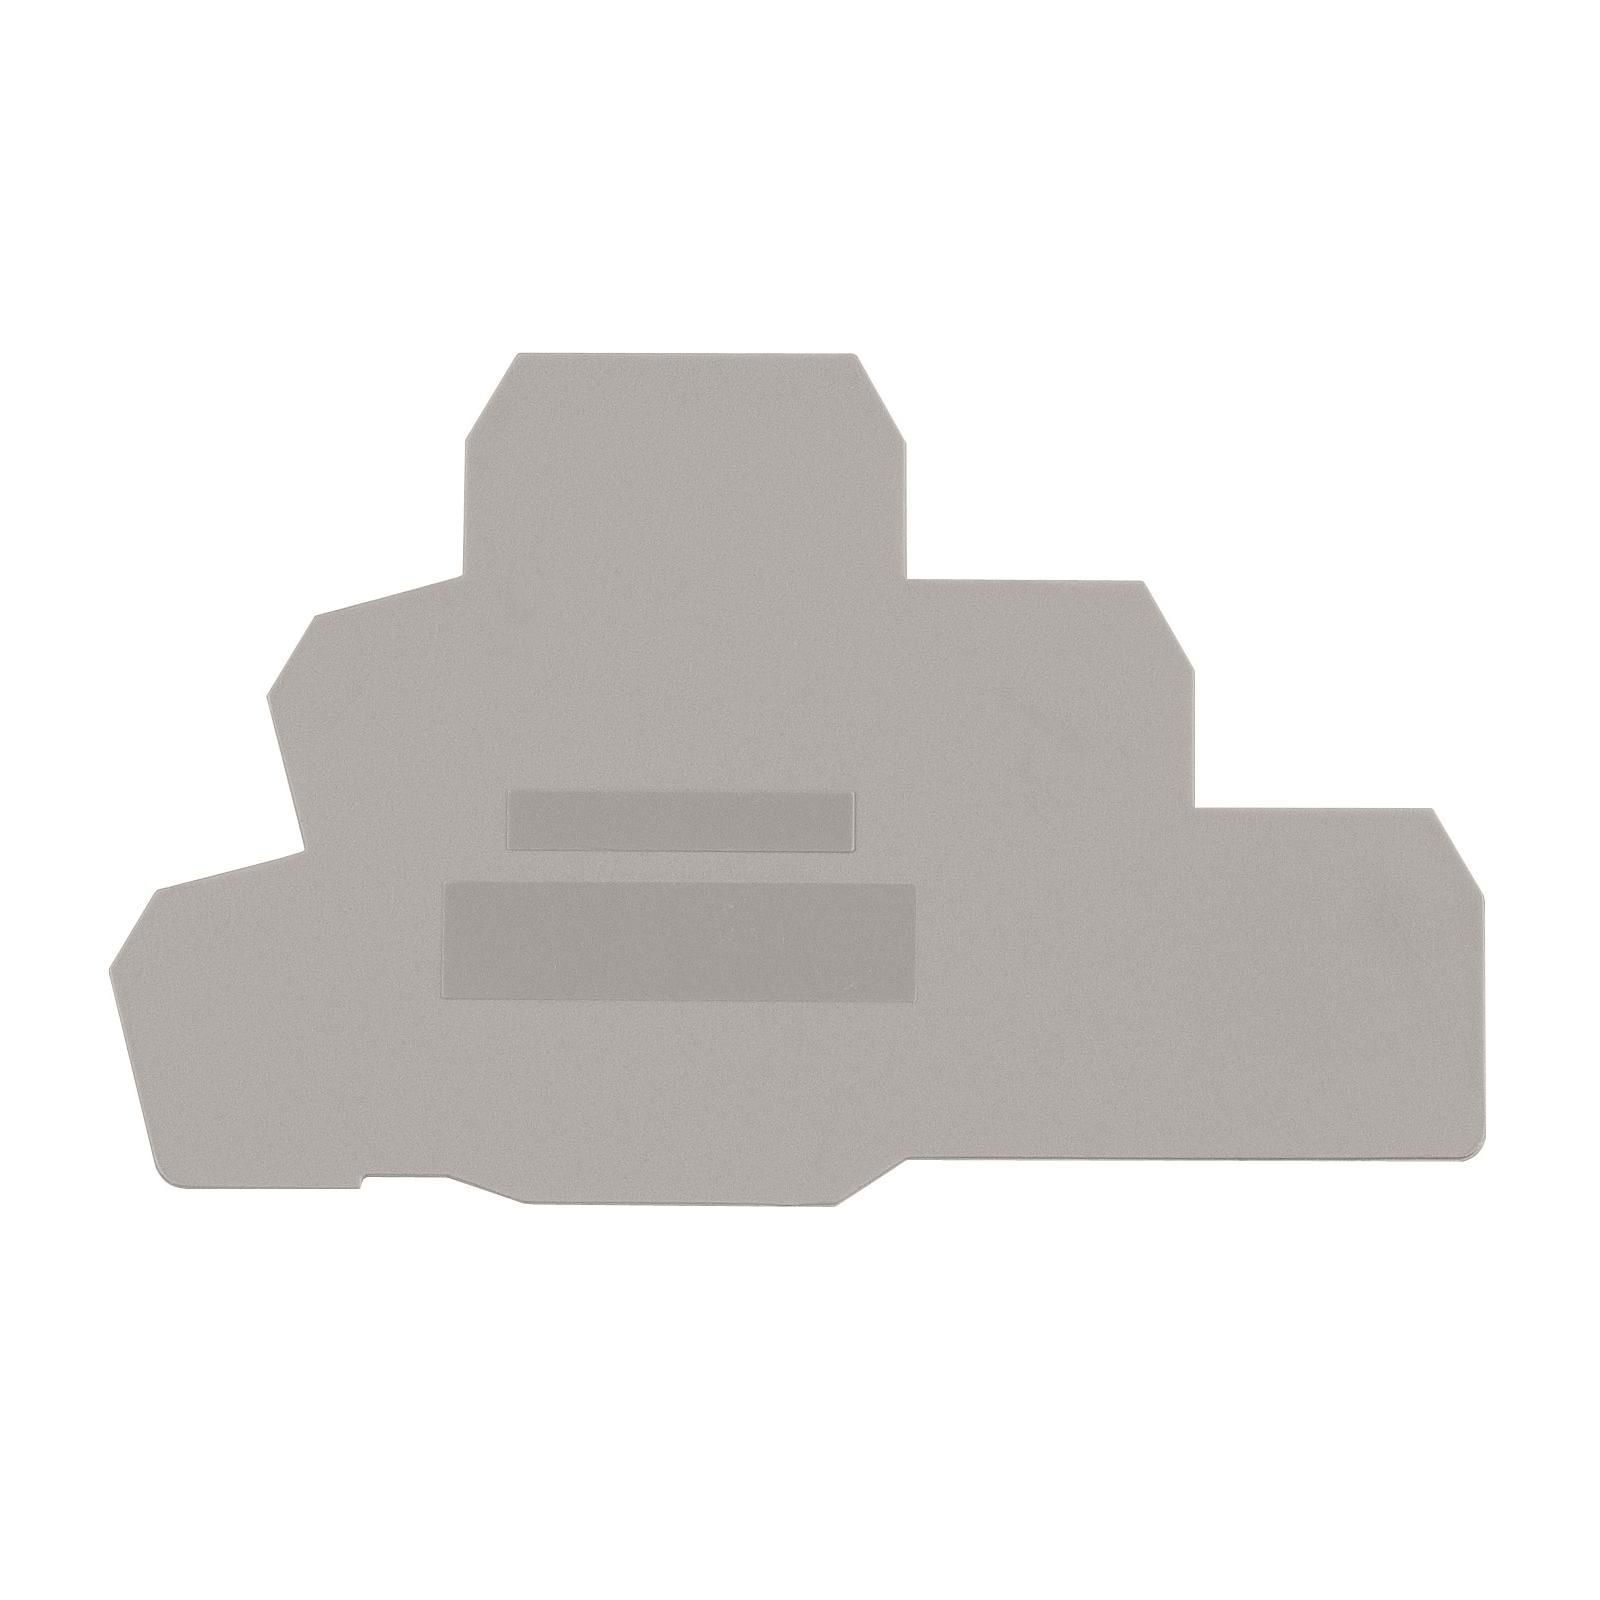 1 Stk Endplatte für Dreistockklemme PUK 3 grau IK680201--